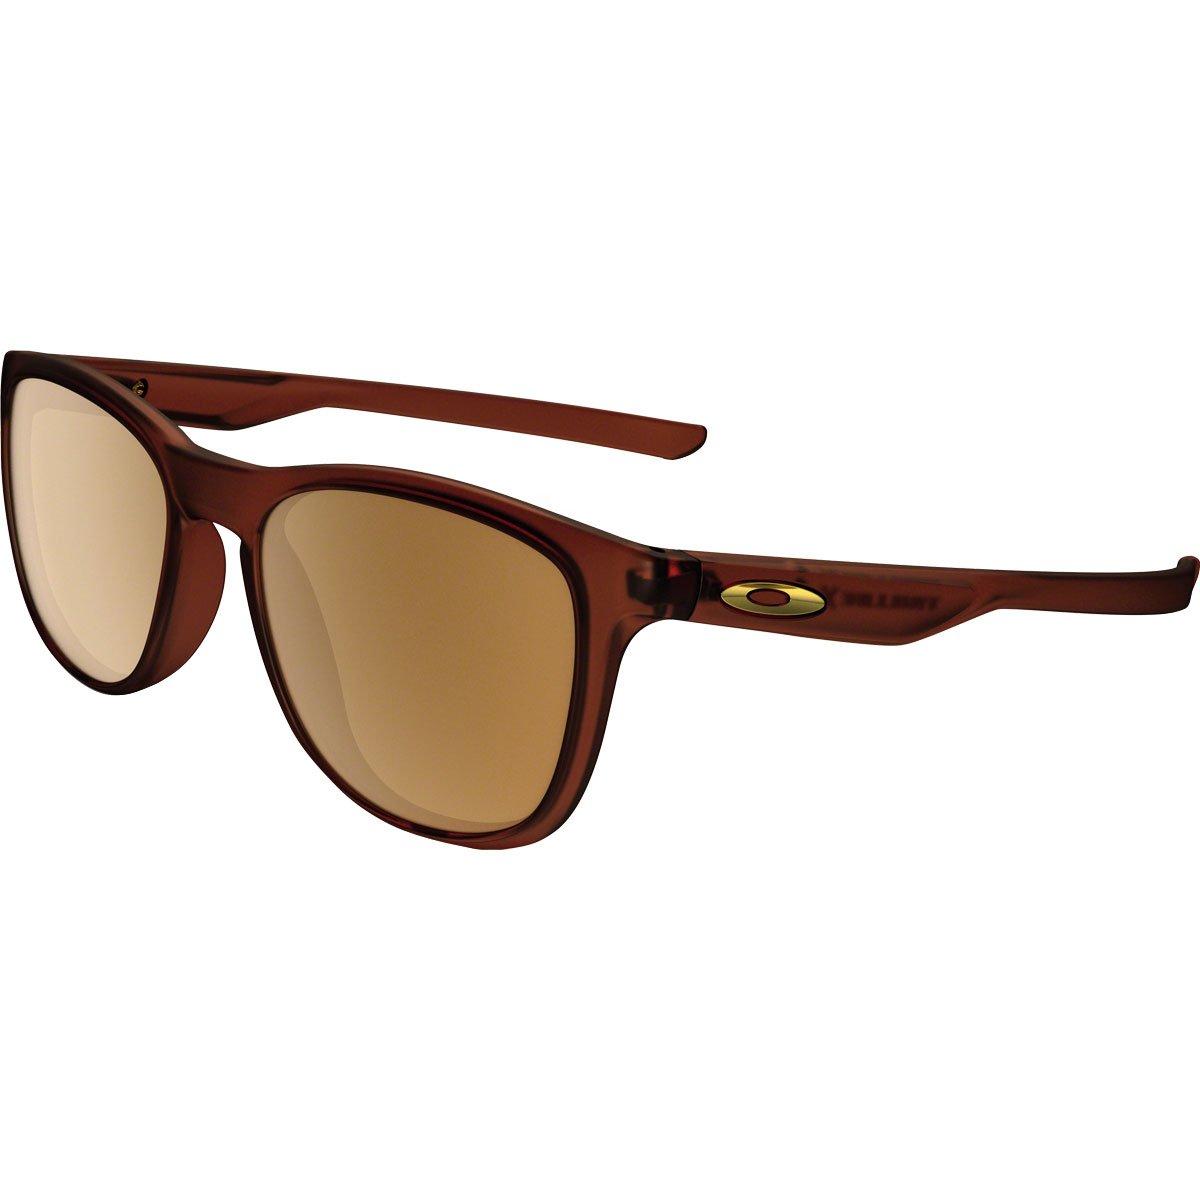 Oakley Men's OO9340 Trillbe X Rectangular Sunglasses, Polished Rootbeer/Dark Bronze, 52 mm by Oakley